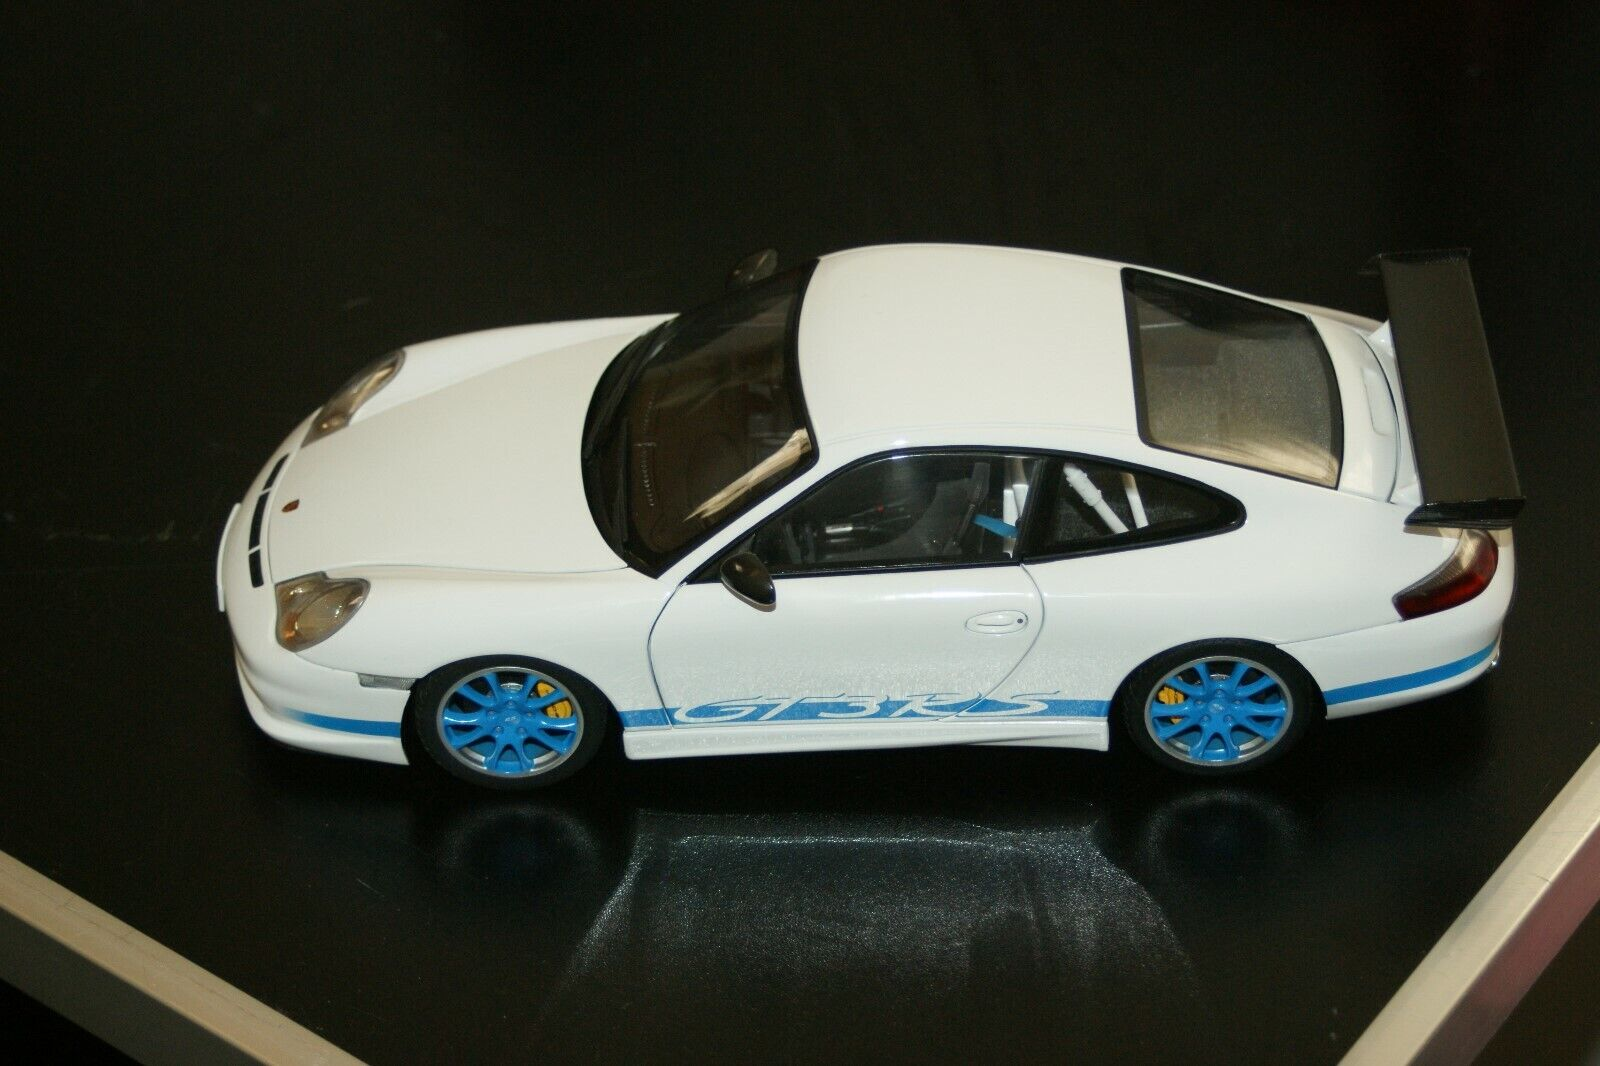 1 18 Autoart Porsche 911 997 GT3 RS Weiß   Blau stripes